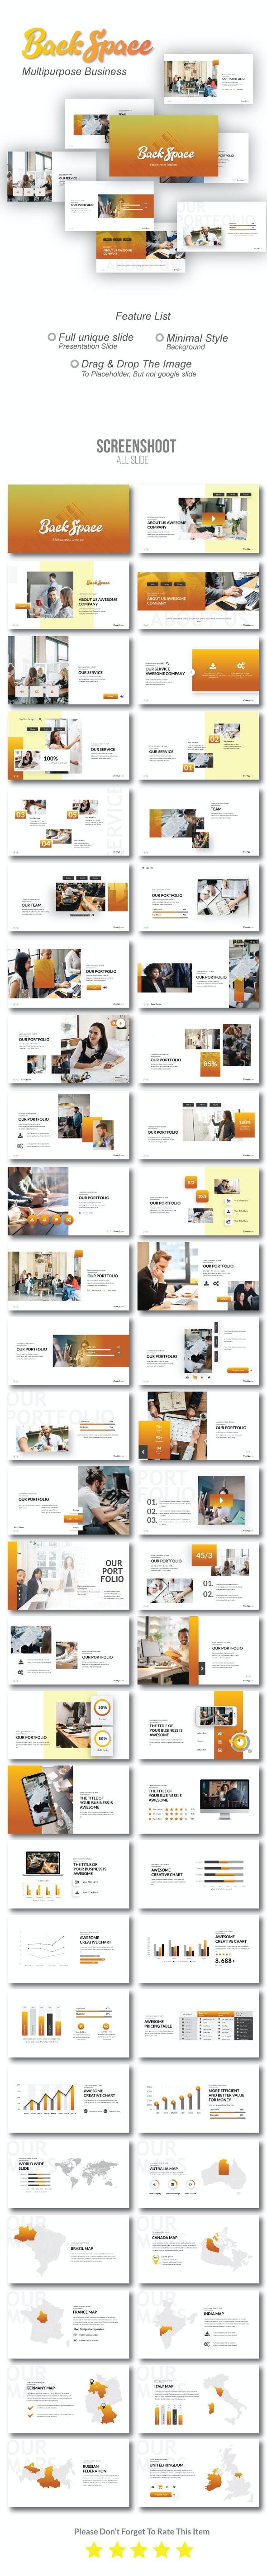 Backspace Business Powerpoint - Business PowerPoint Templates